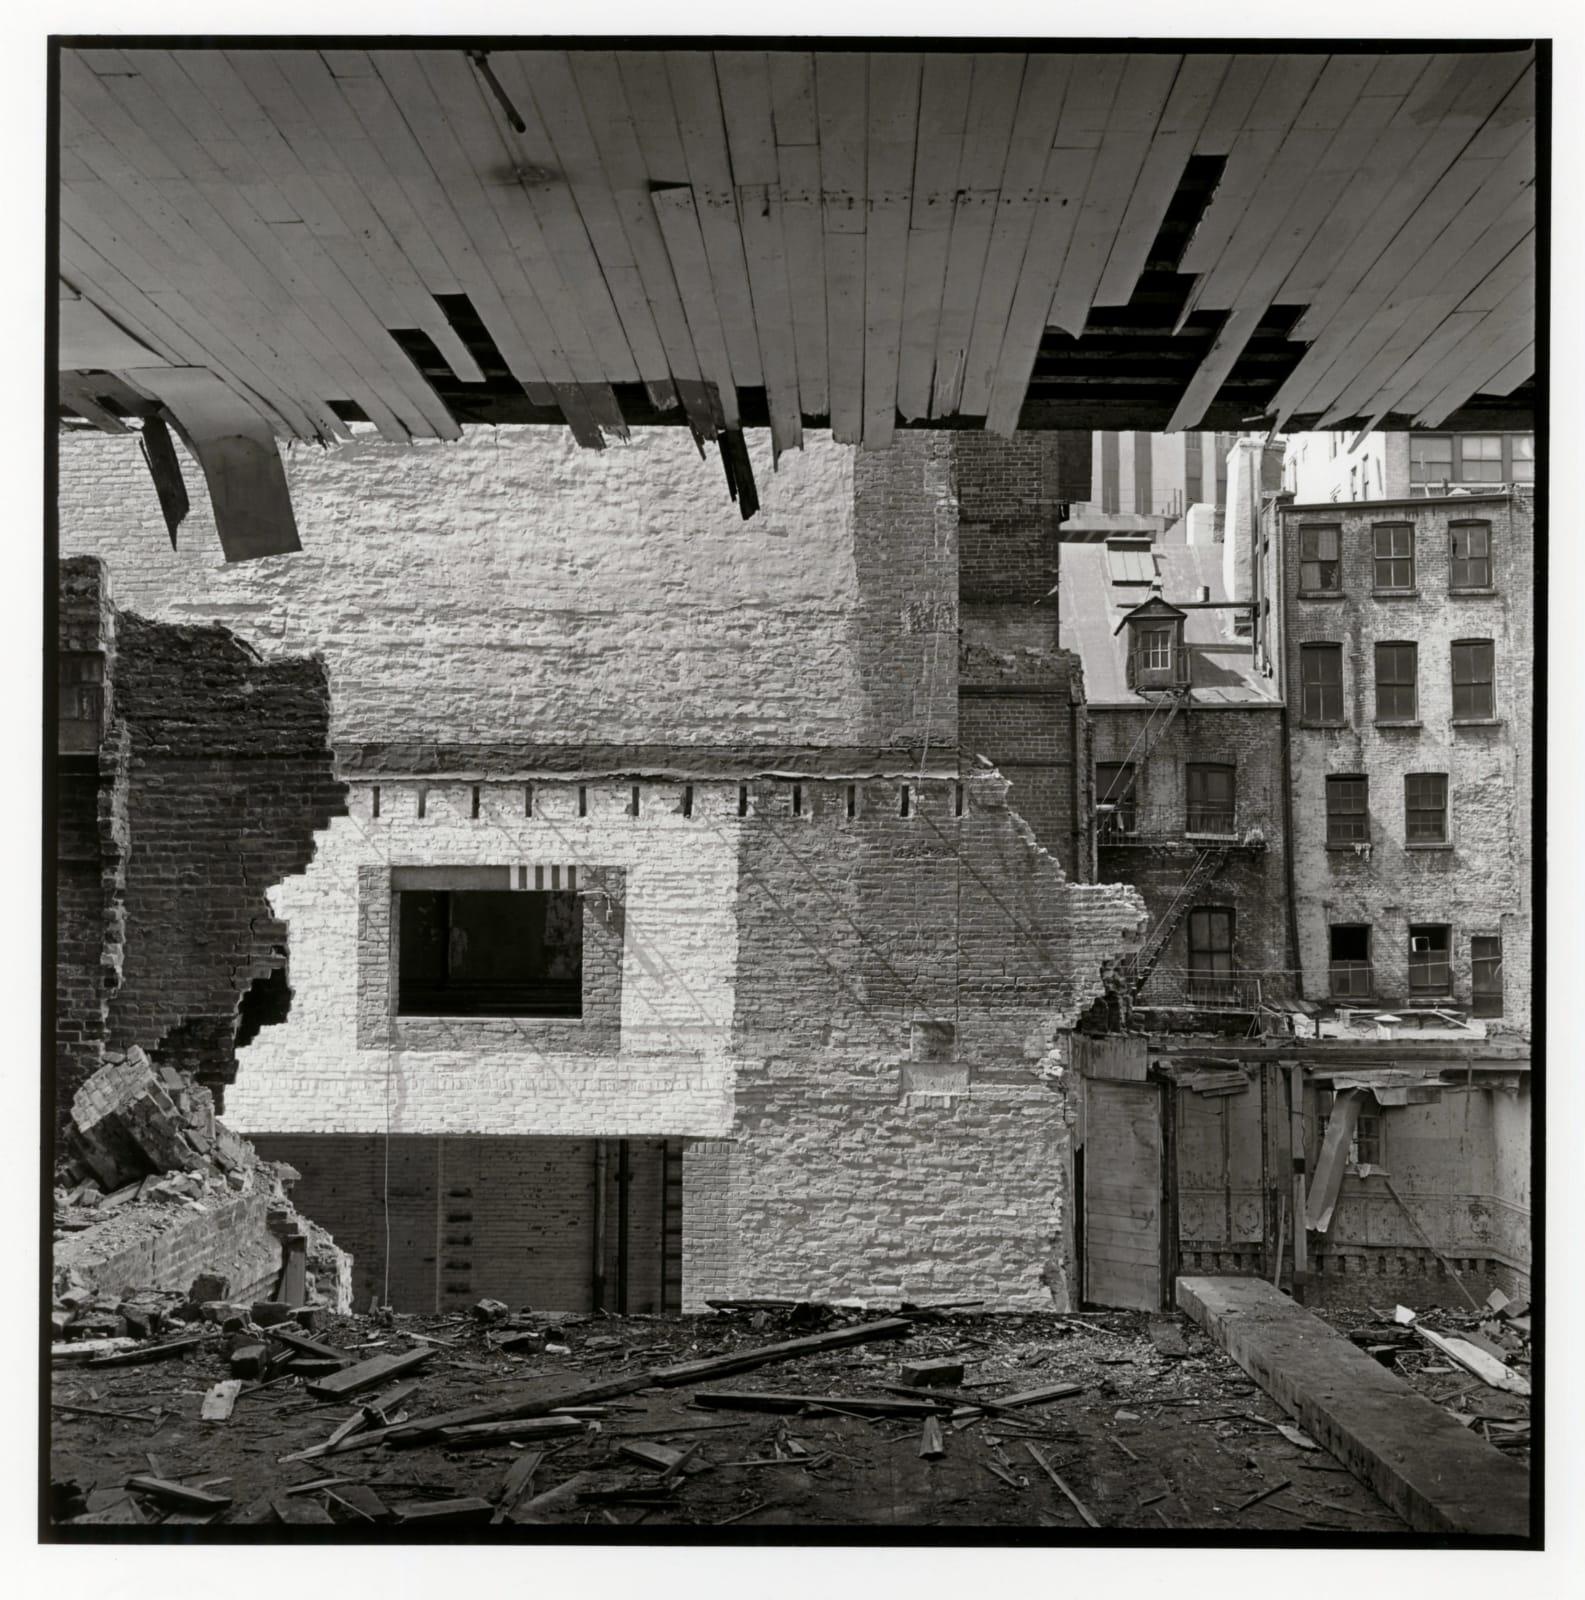 Danny Lyon - View Through The Rear Wall, 89 Beekman Street, Lower Manhattan, 1967